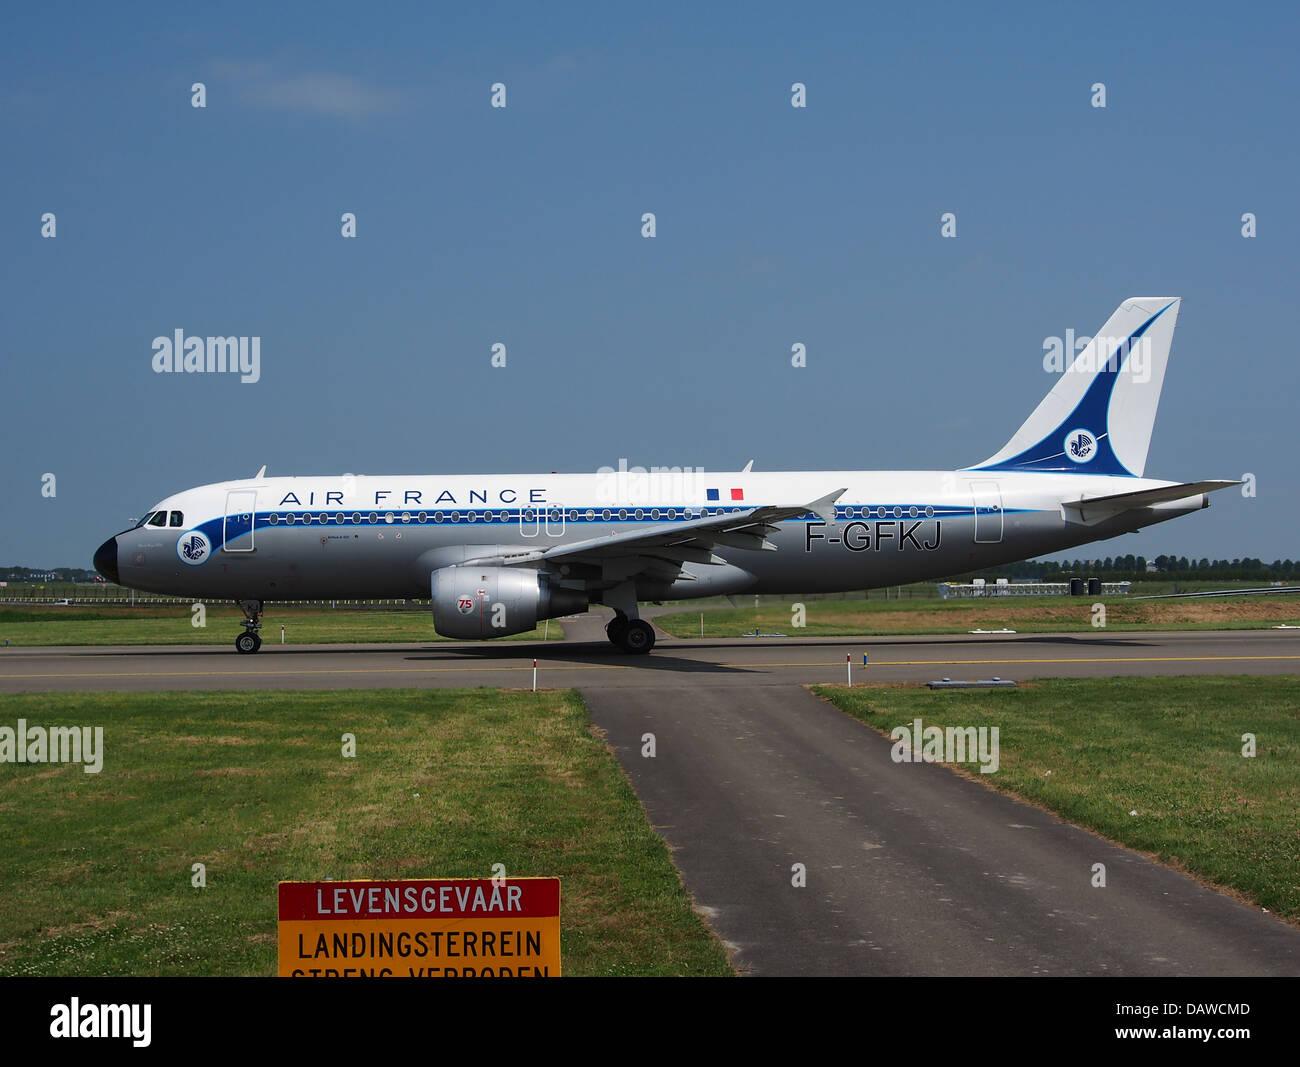 F-GFKJ Air France Airbus A320-211 - cn 063 - 4 Photo Stock